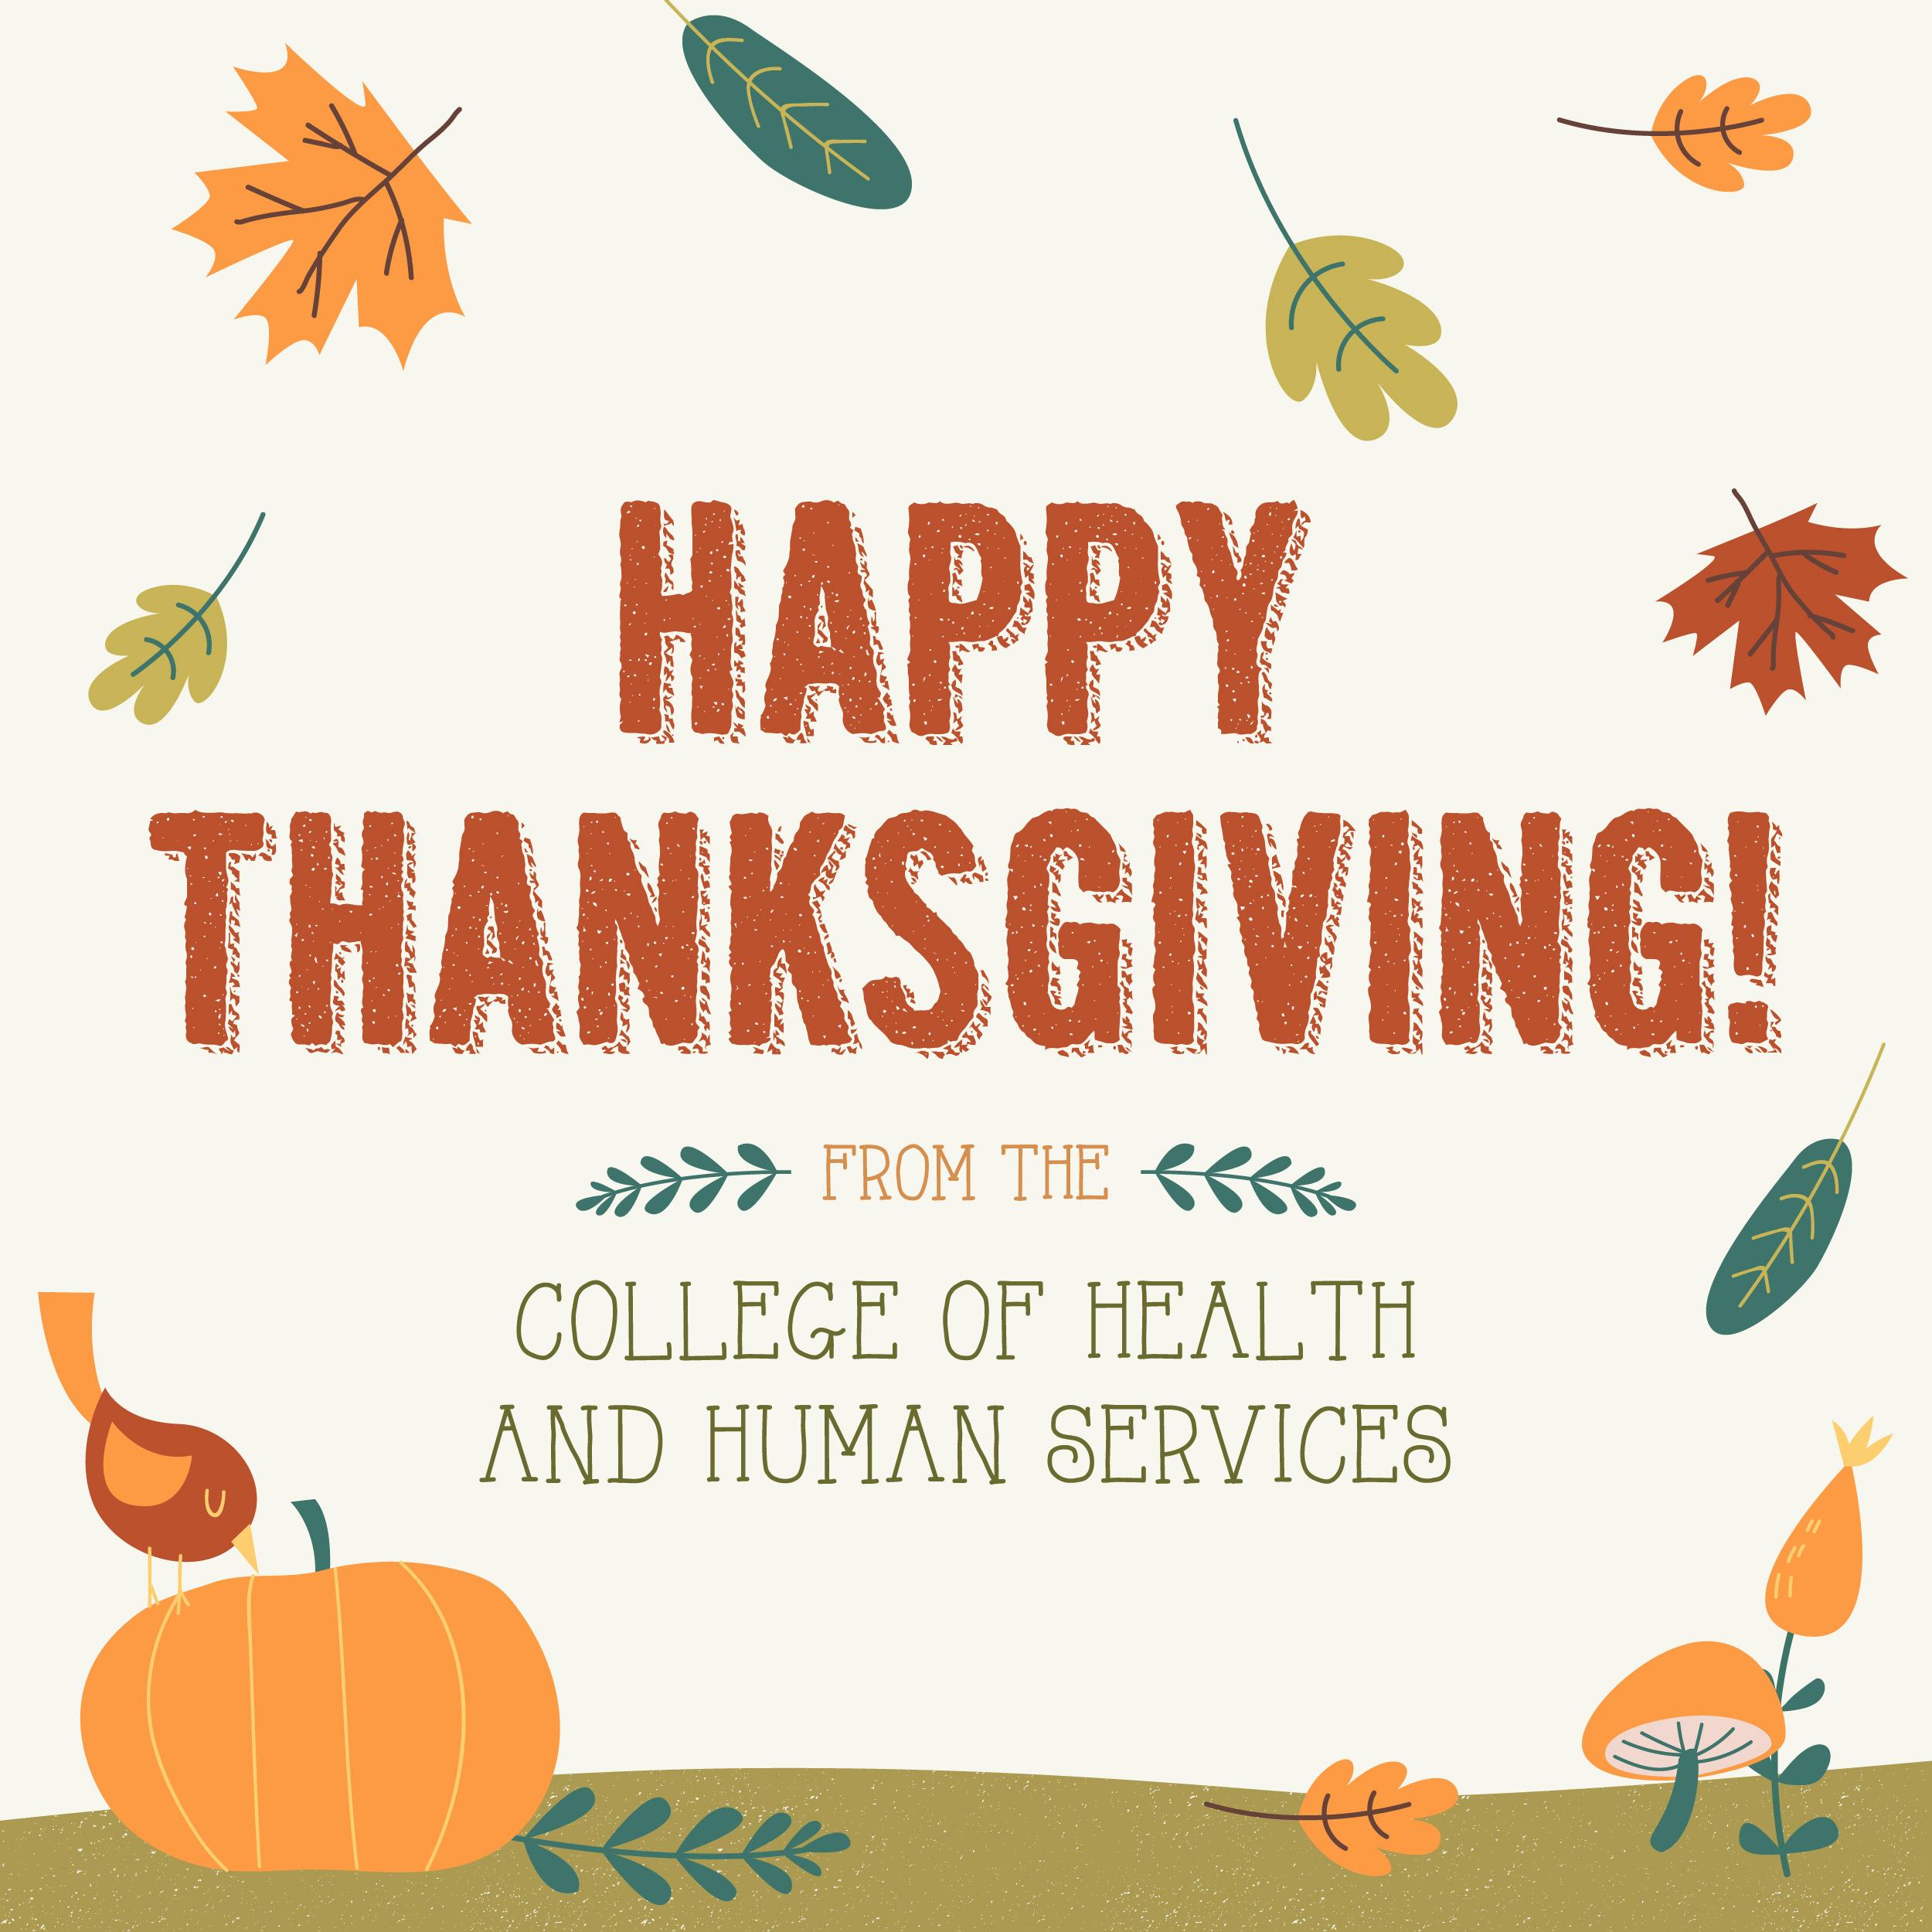 CHHS_Thanksgiving-01.jpg